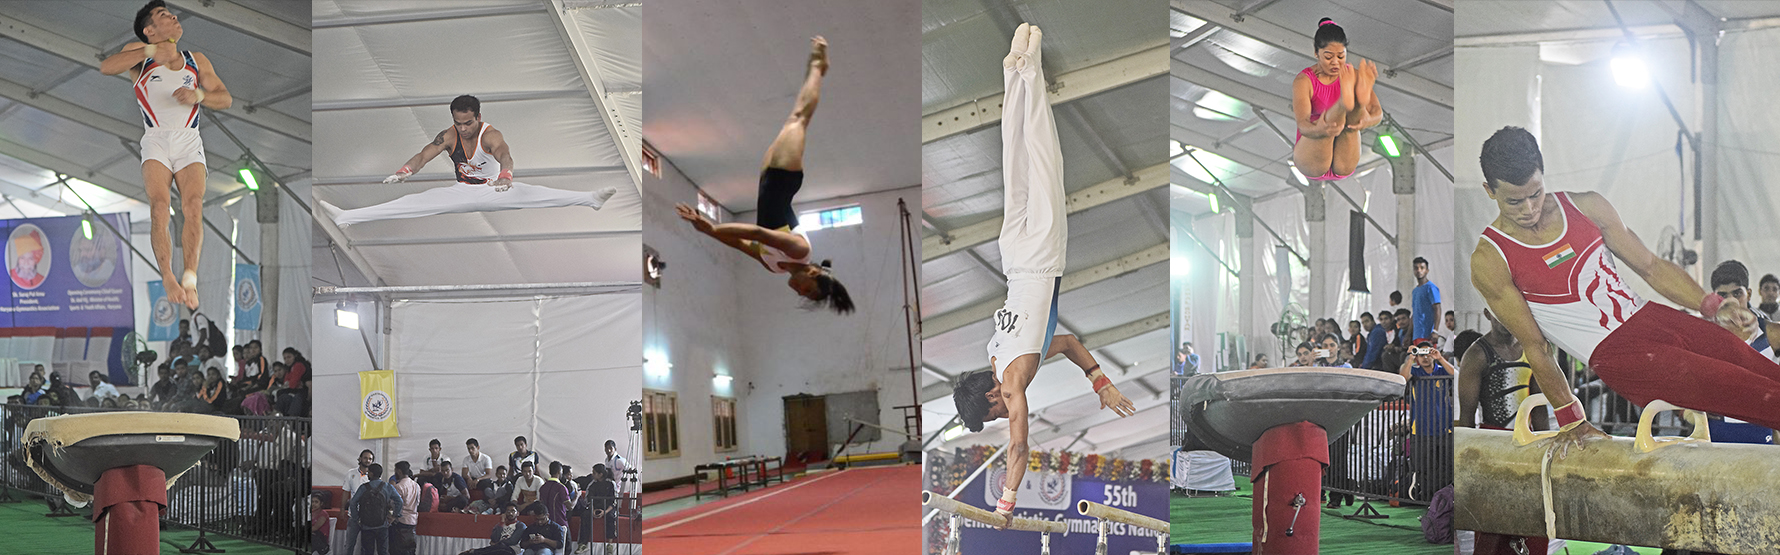 India at 2017 Artistic Gymnastics World Championships